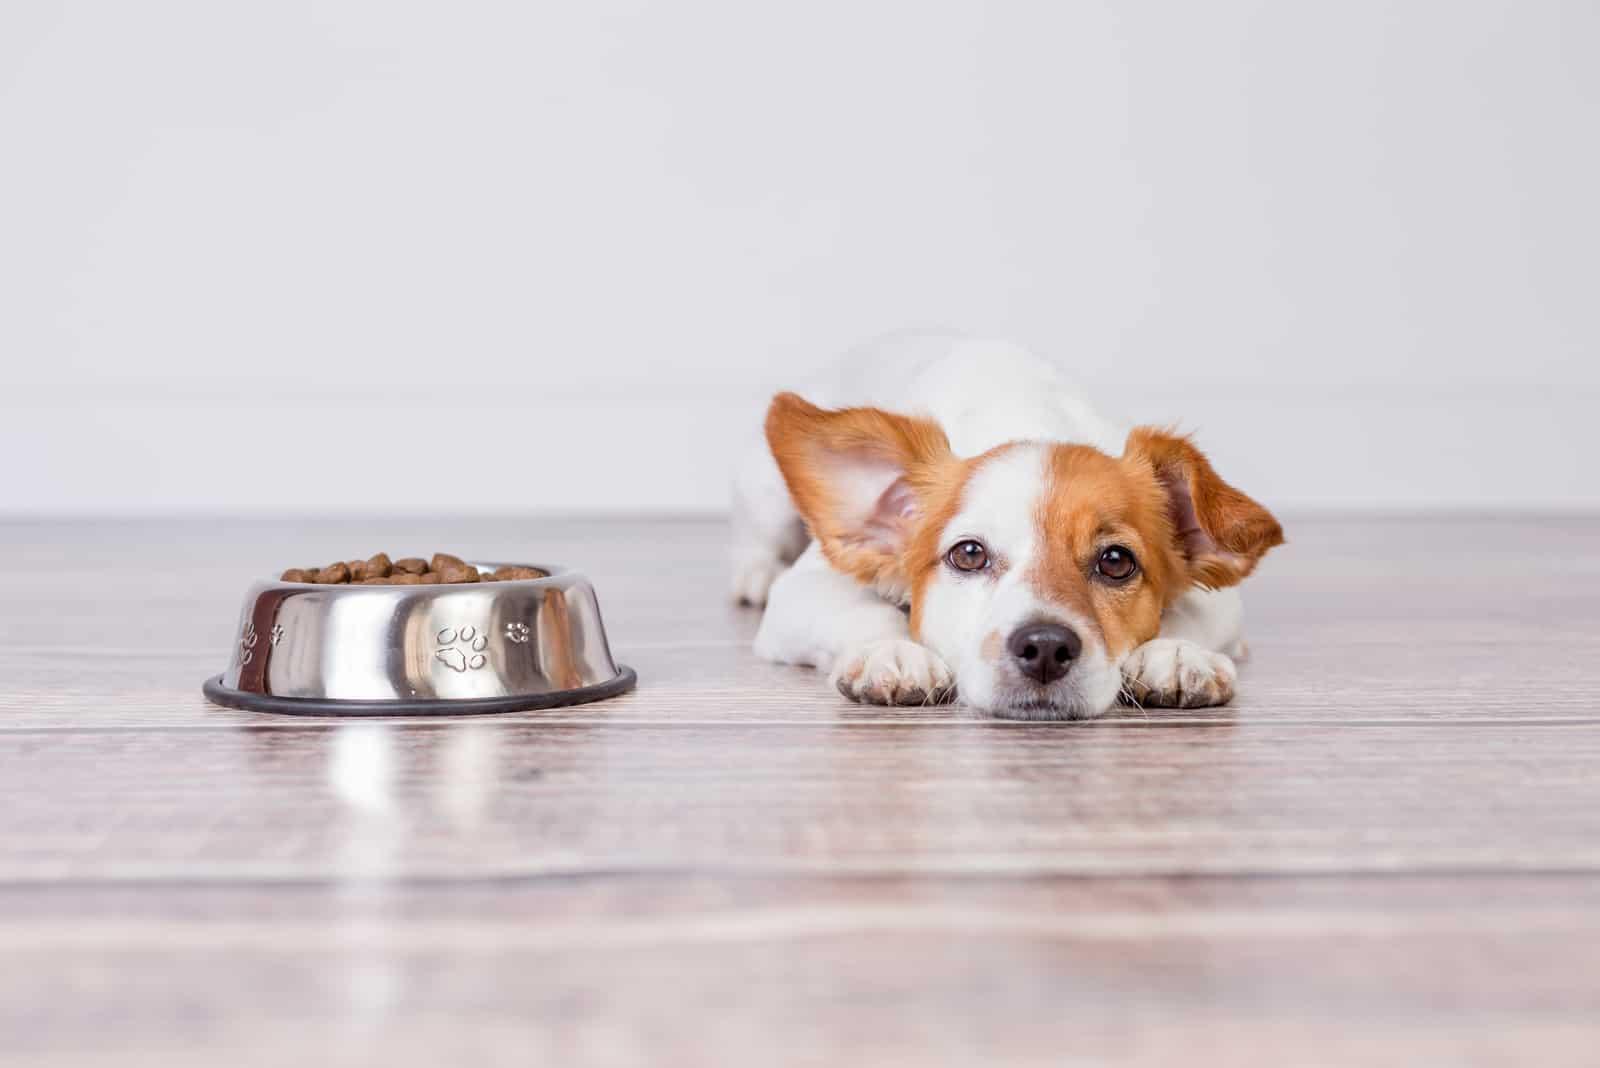 Hund, der an der Schüssel des Futters liegt